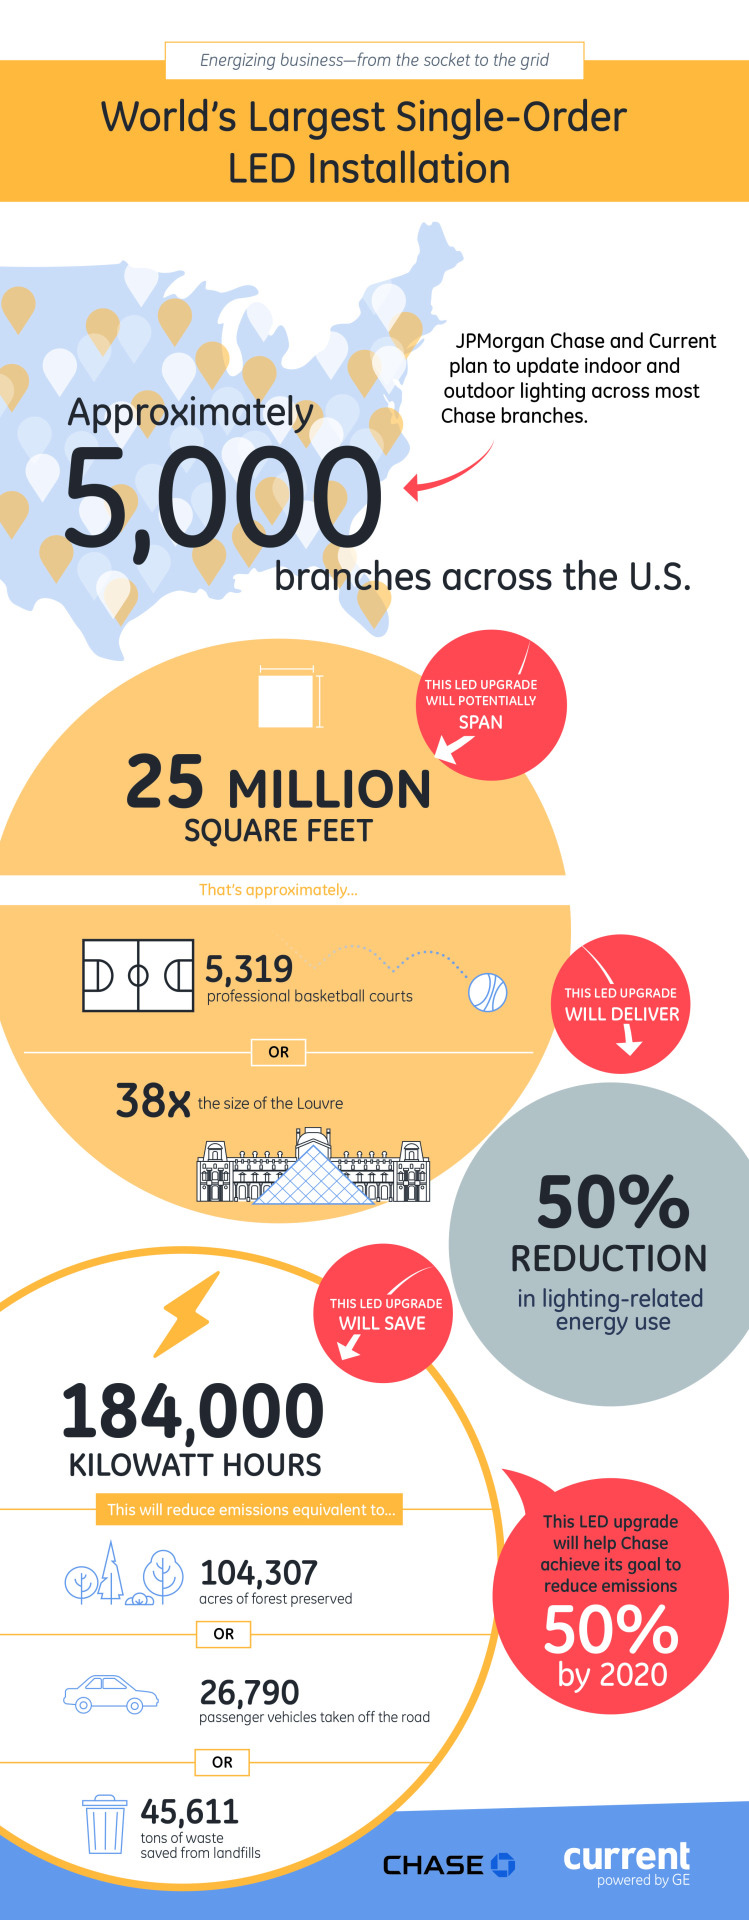 JPMorgan Chase LED installation infographic